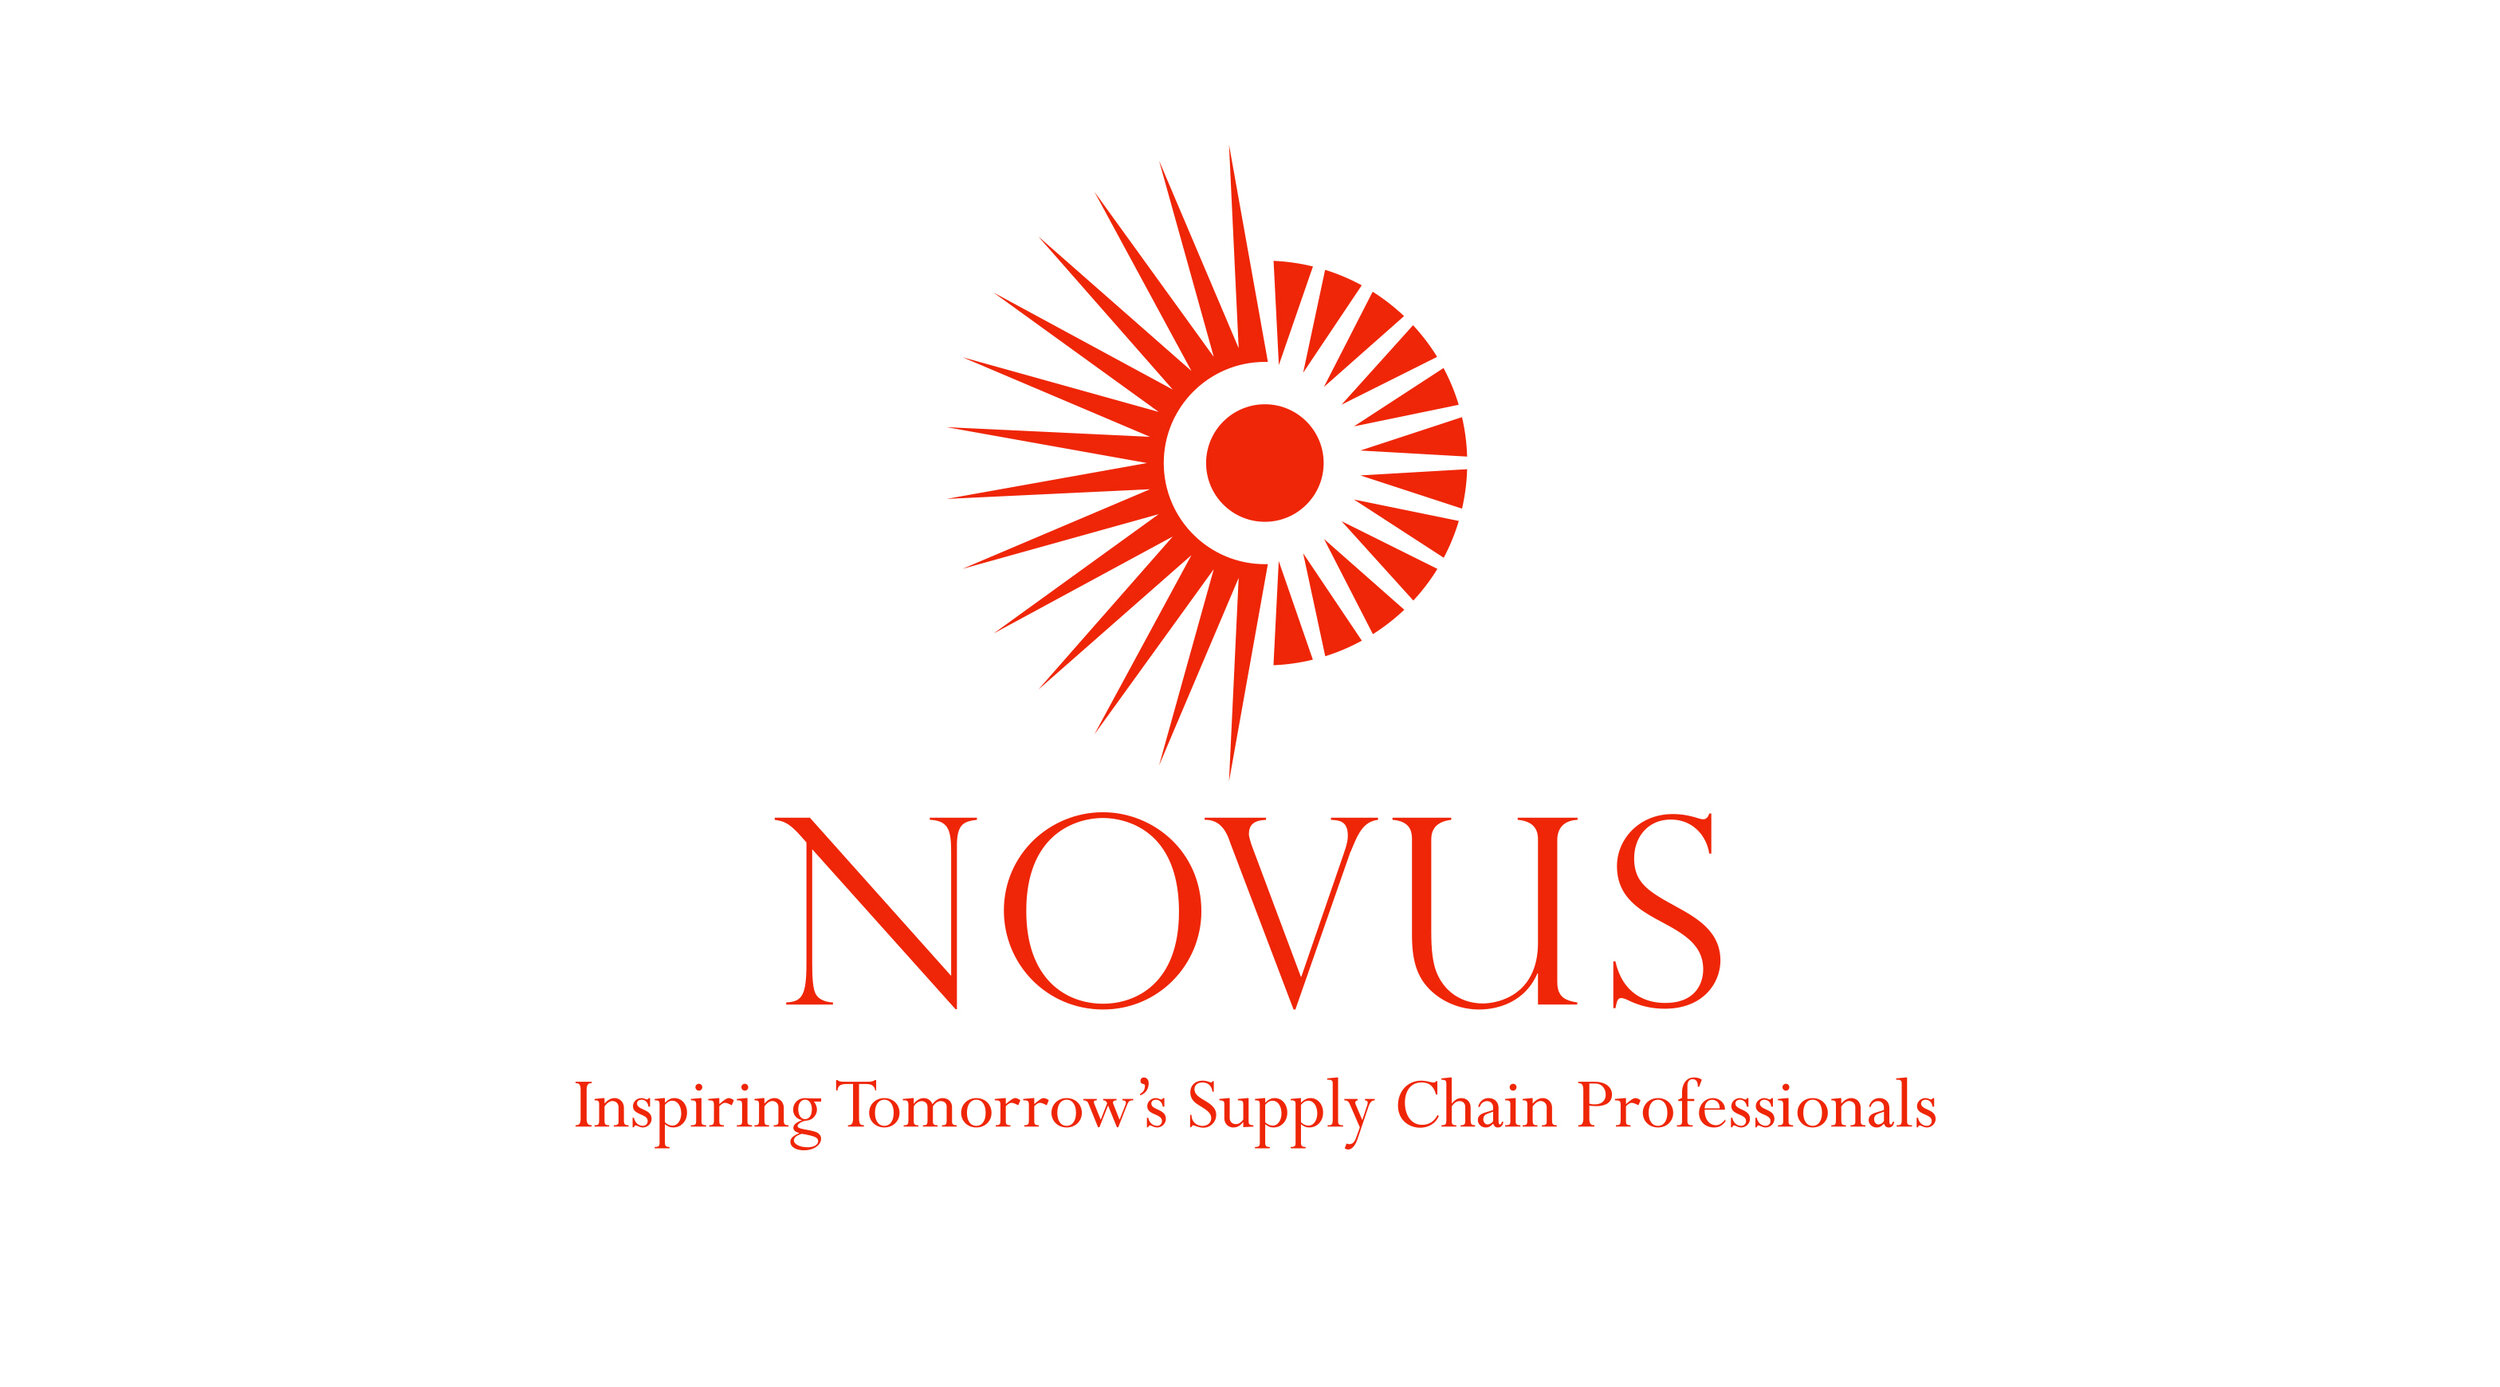 Novus_Logo_Orange&Strap.jpg